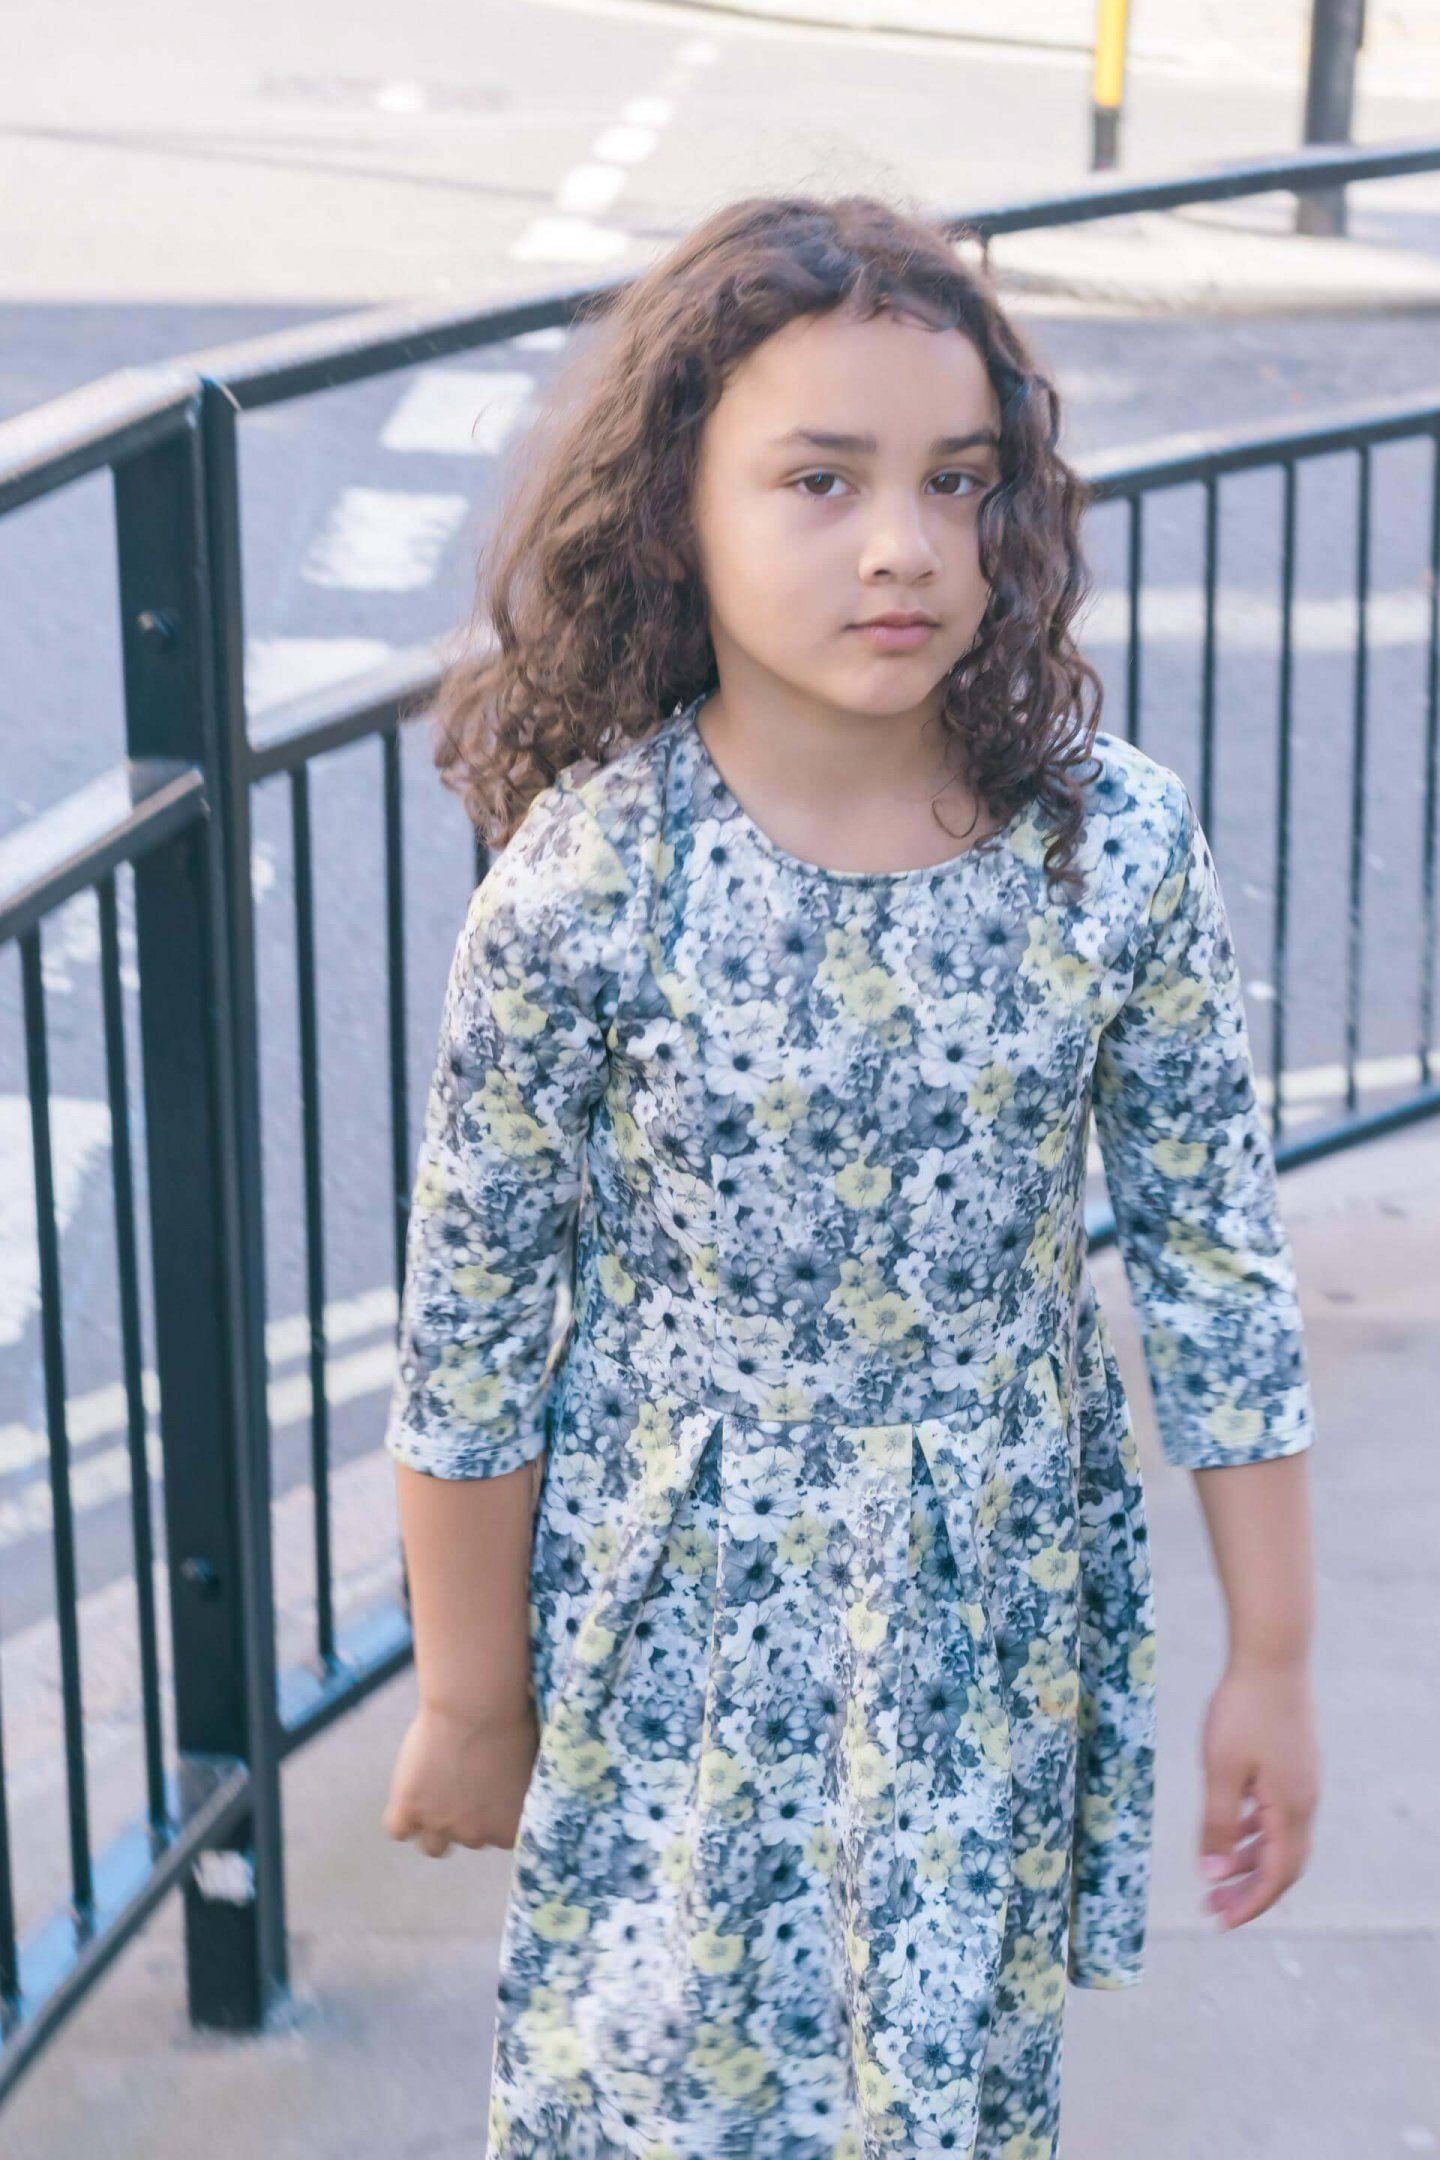 Flower Dress - FNF Dress Girls Fashion, girls summer dress, Girls style, Kids Fashion, Girls FASHION Photography, The Inspiration Edit